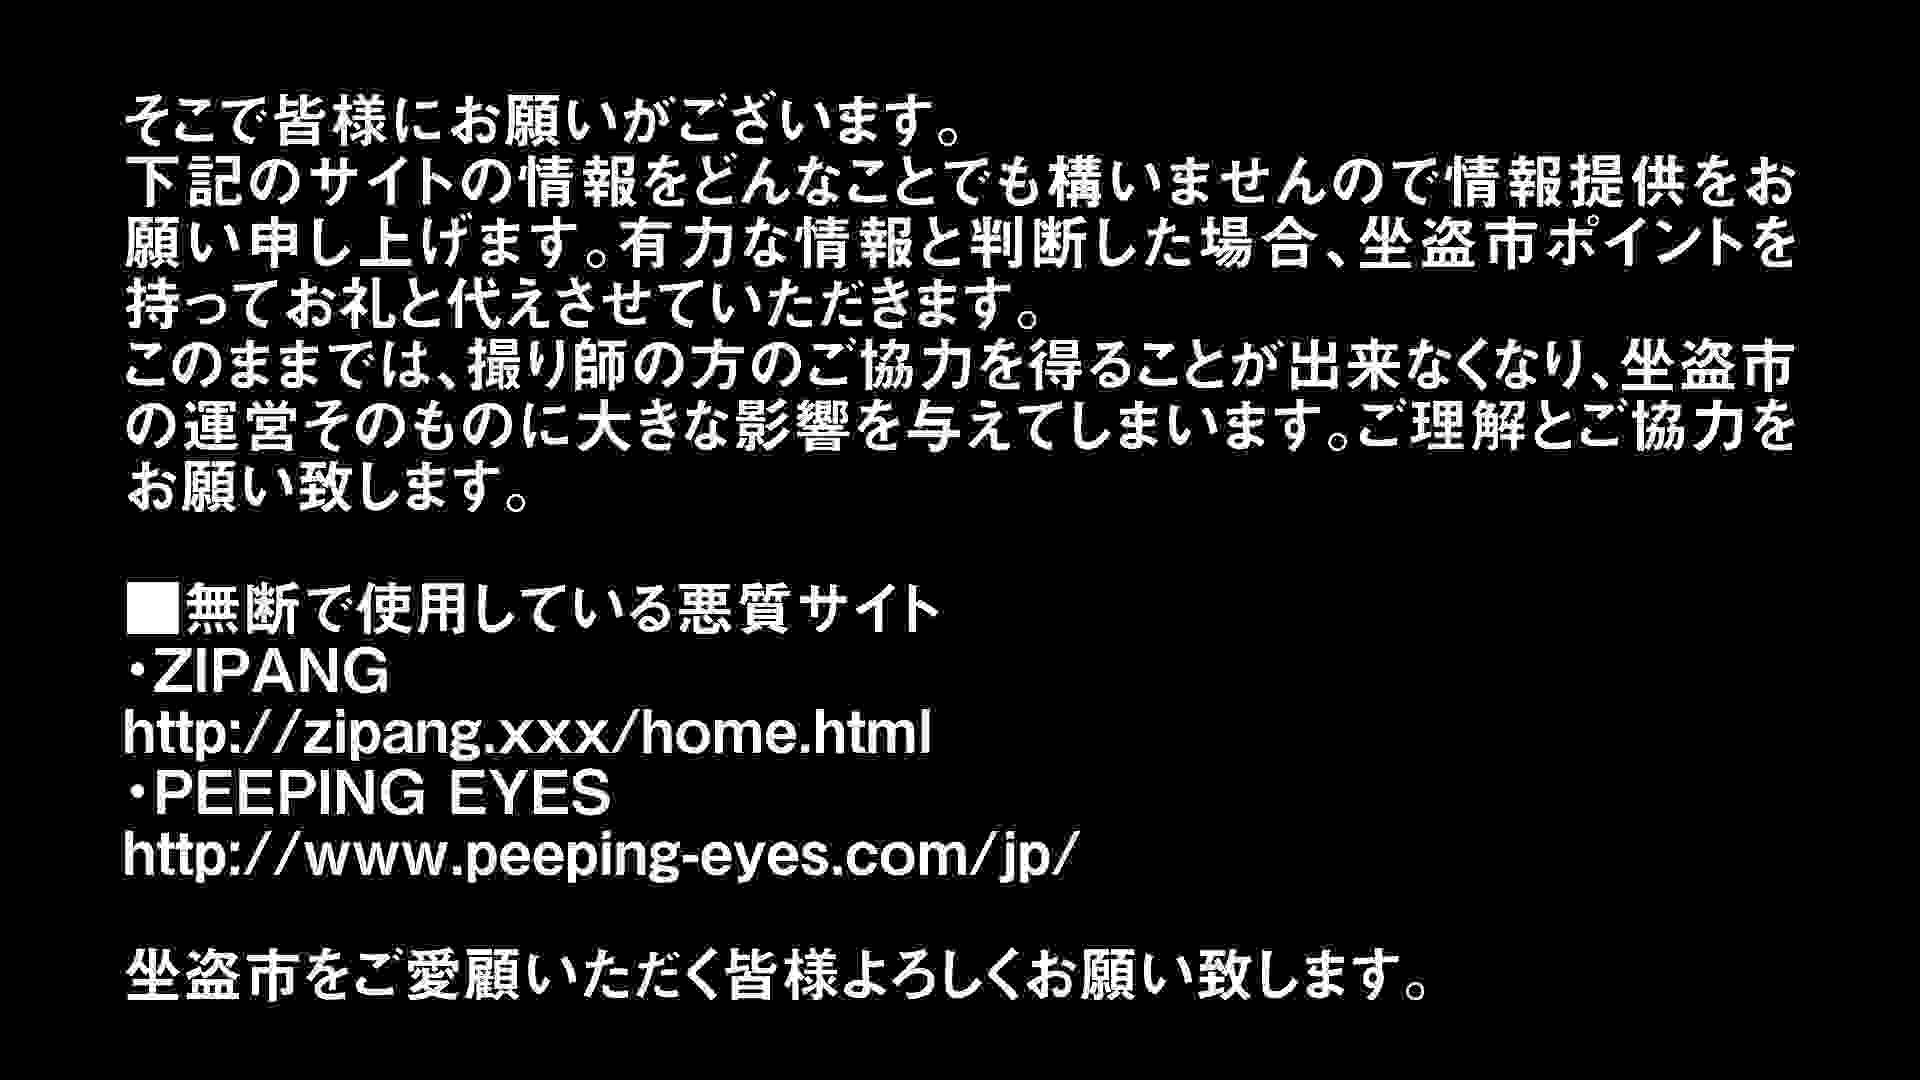 Aquaな露天風呂Vol.300 盗撮シリーズ | 露天風呂編  110PIX 47